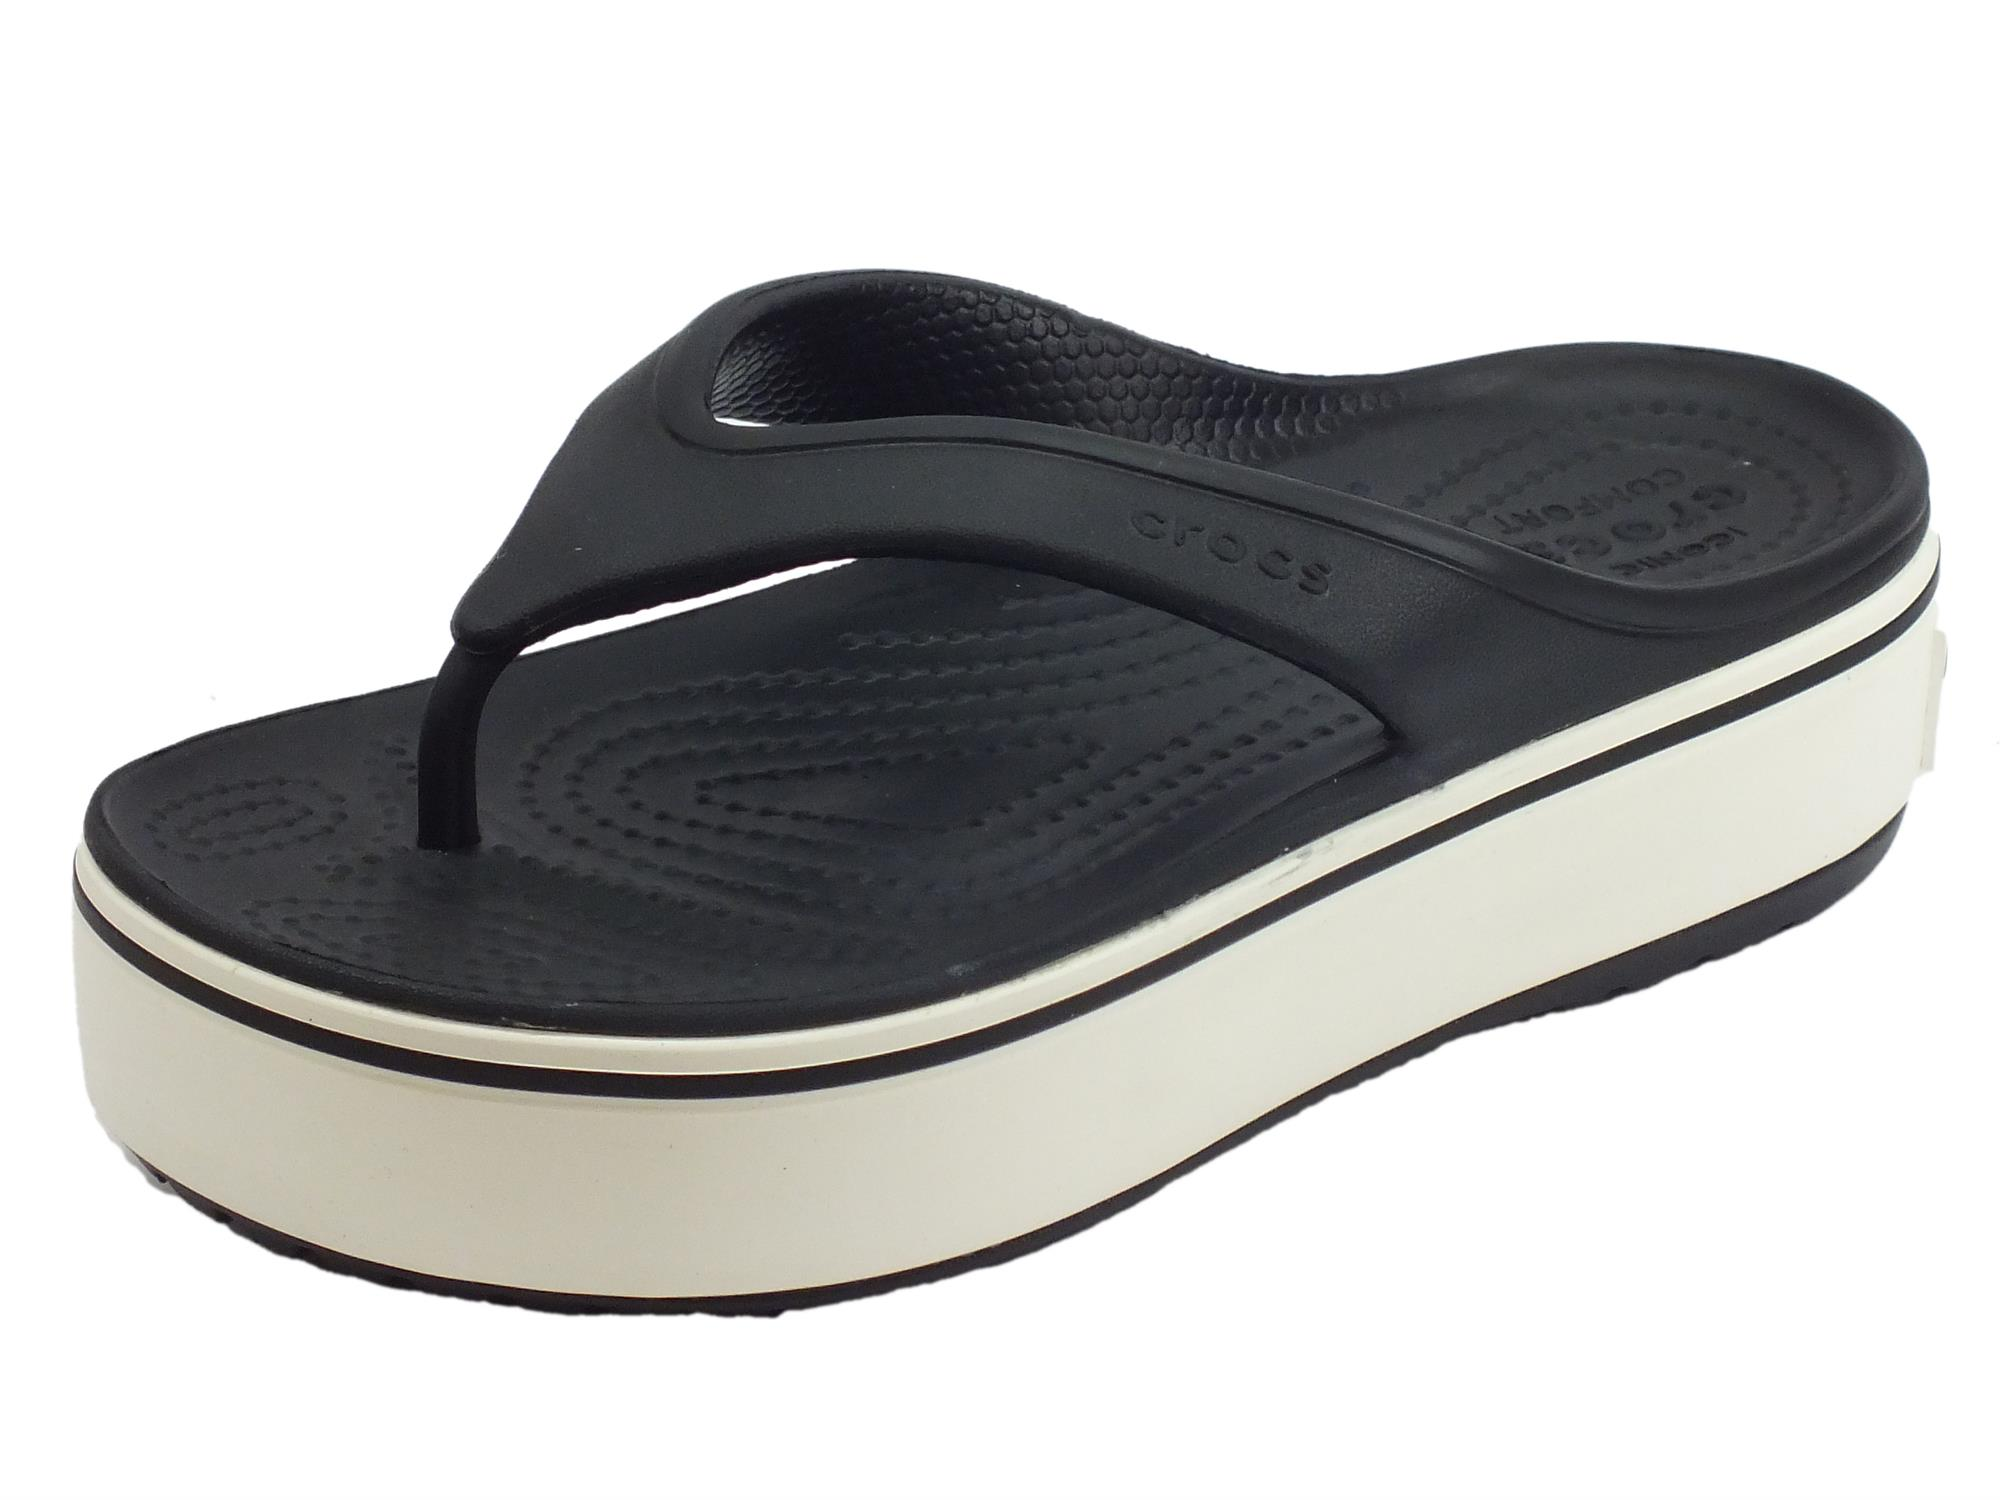 quality design d440e 75d1f Crocs Platform flip black white infradito donna in gomma nera zeppa alta